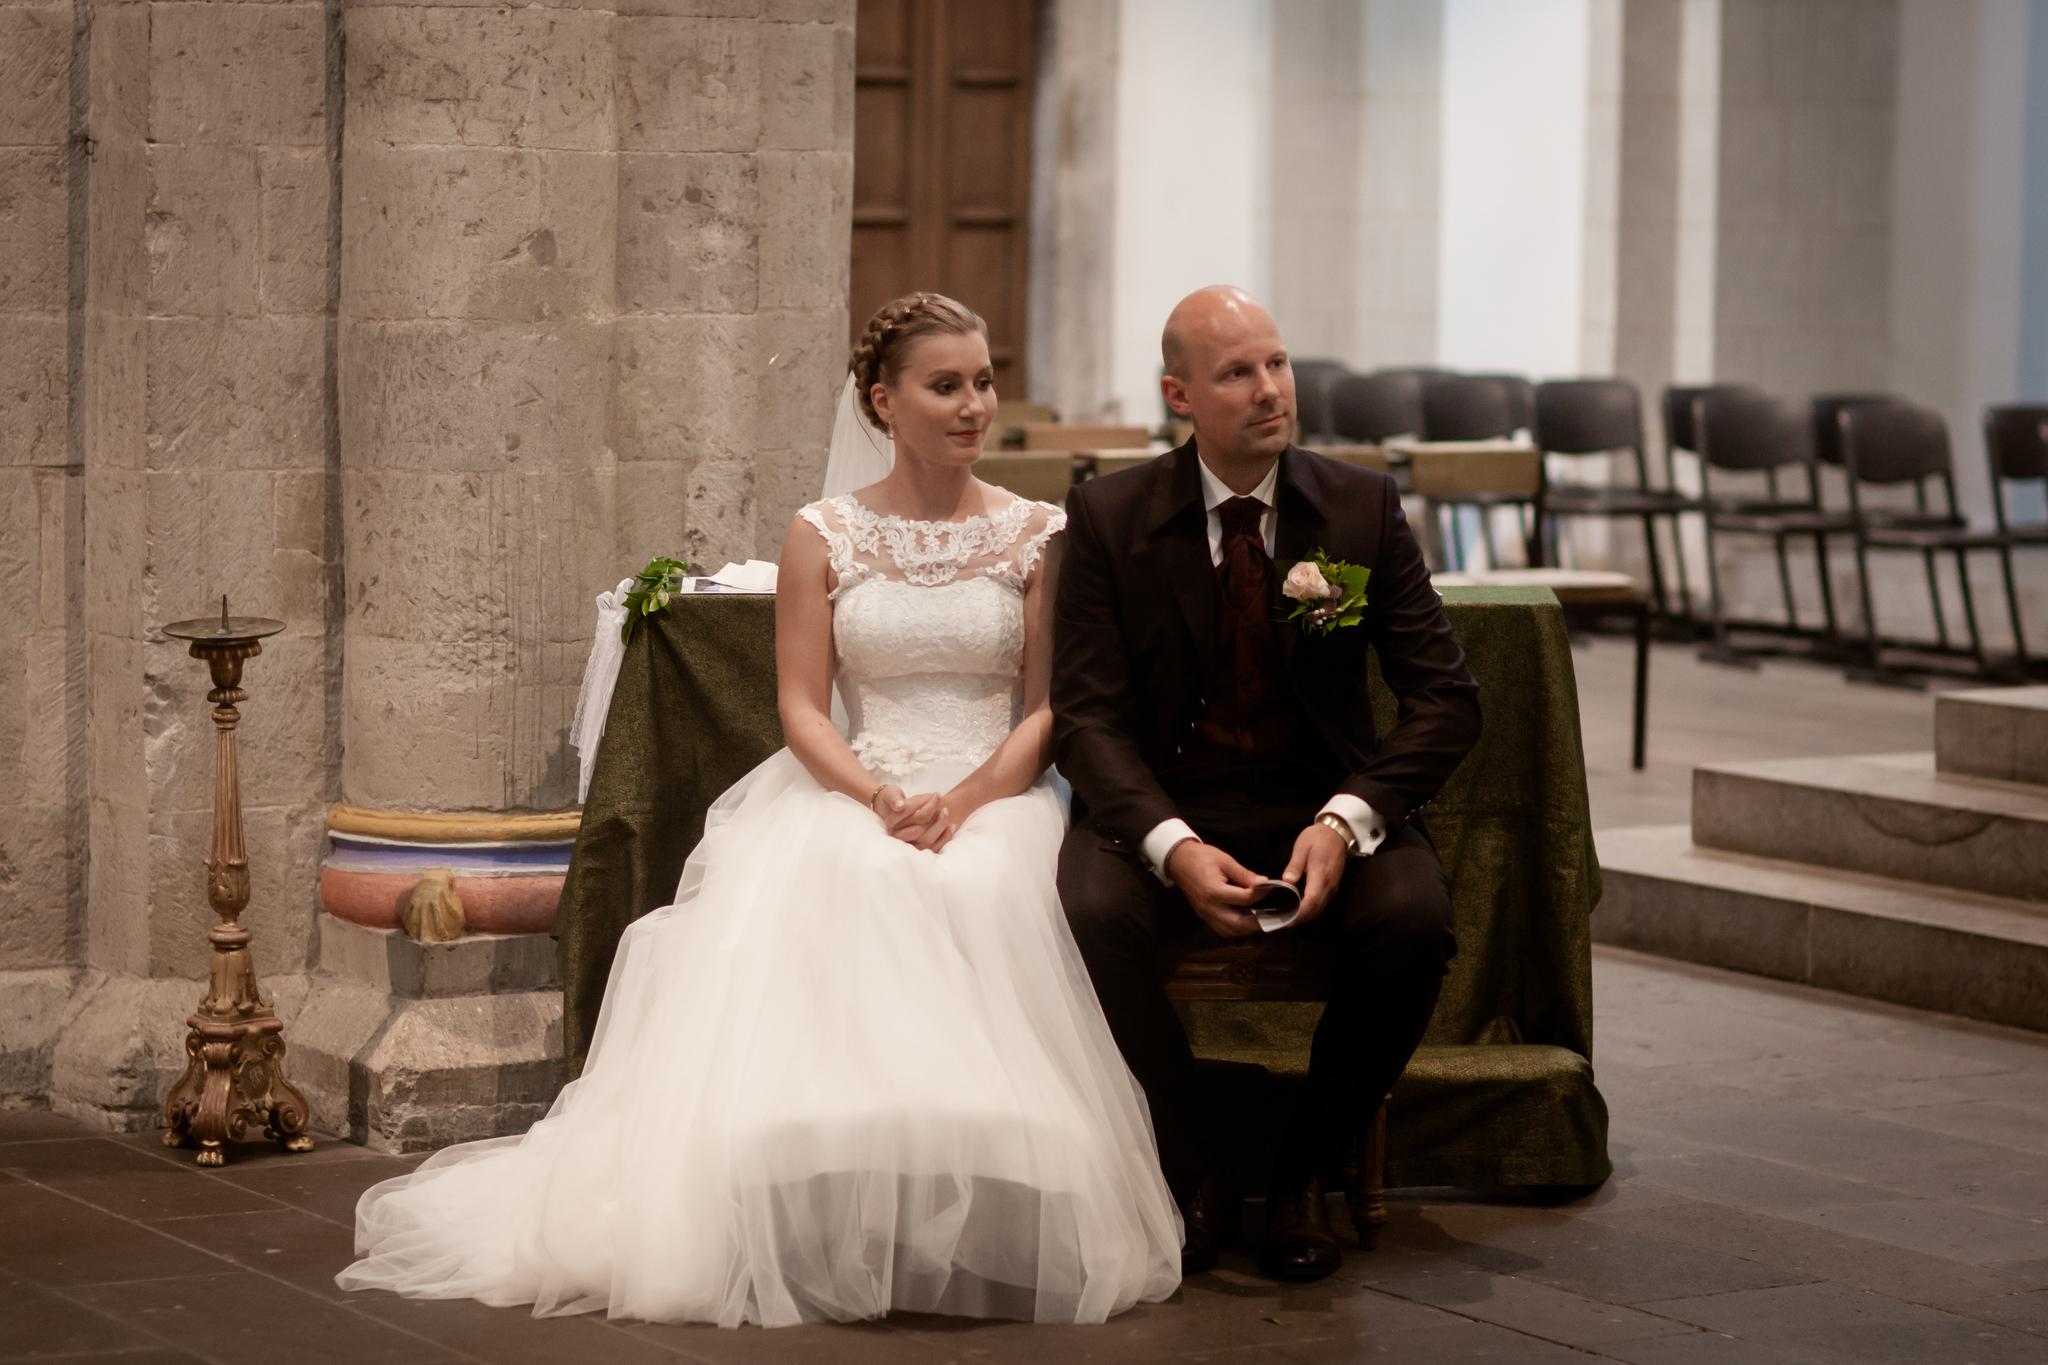 Claudia Krawinkel Fotografie Hochzeitsfotograf Essen Düsseldorf Dormagen Kloster Knechtsteden Hochzeitsreportage Hochzeit Knechtsteden61